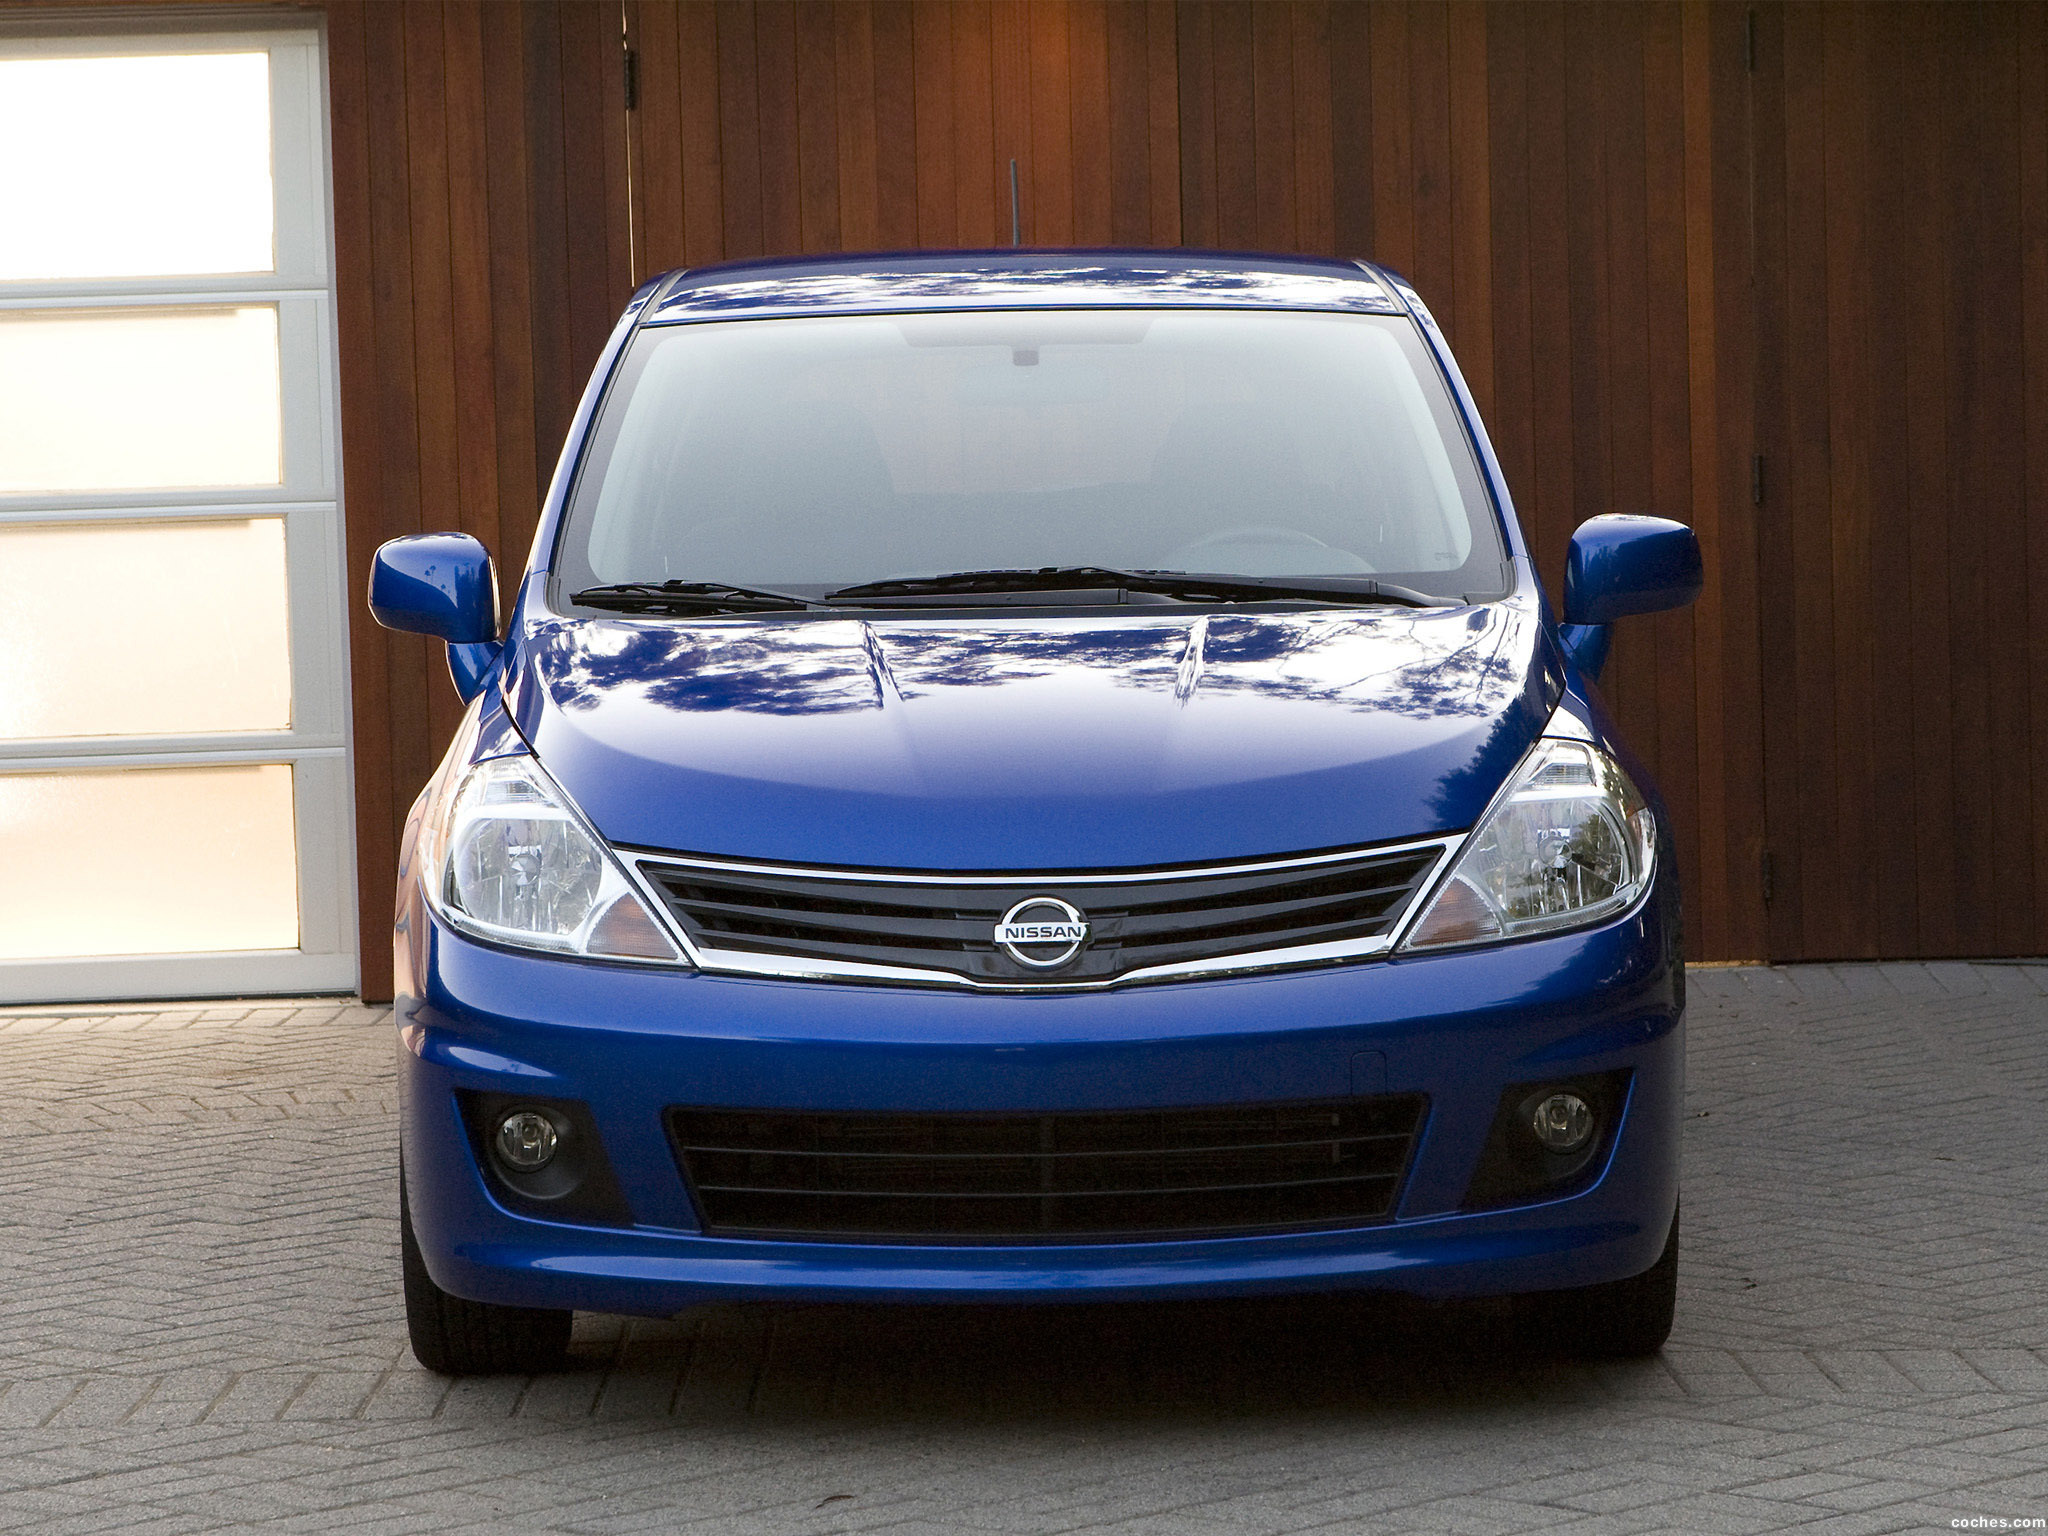 Foto 7 de Nissan Versa Hatchback 2009